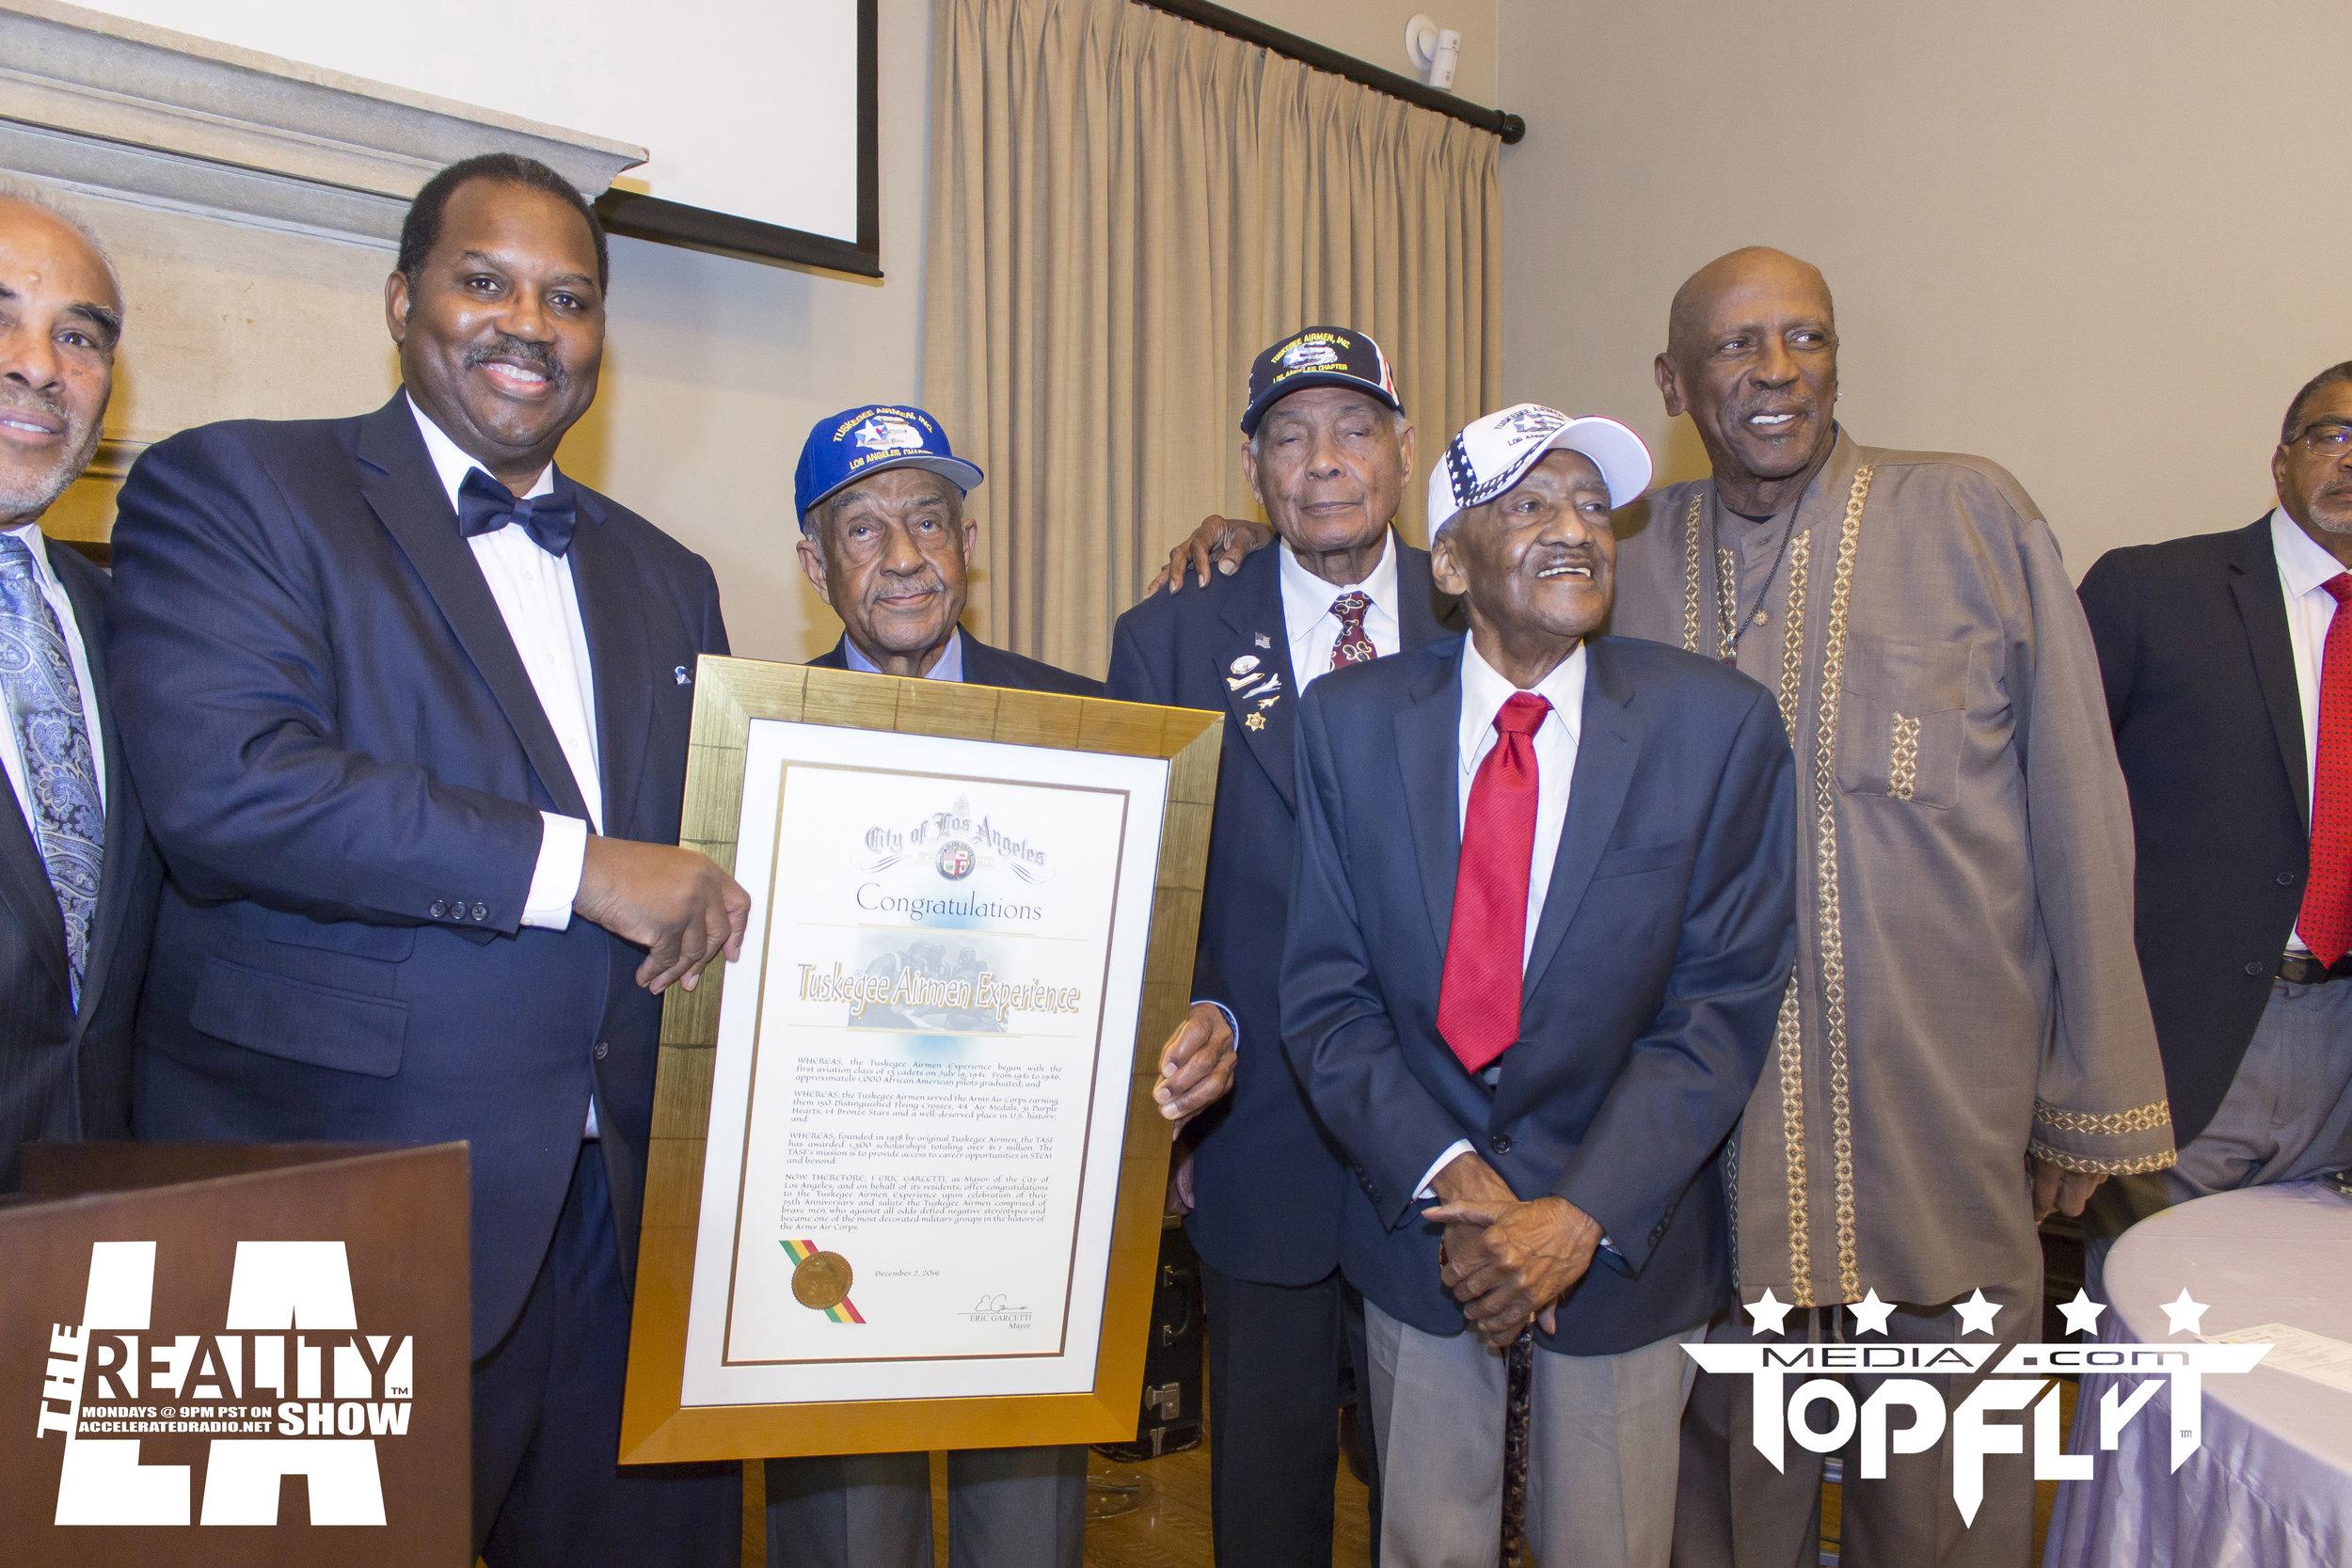 The Reality Show LA - Tuskegee Airmen 75th Anniversary VIP Reception_125.jpg